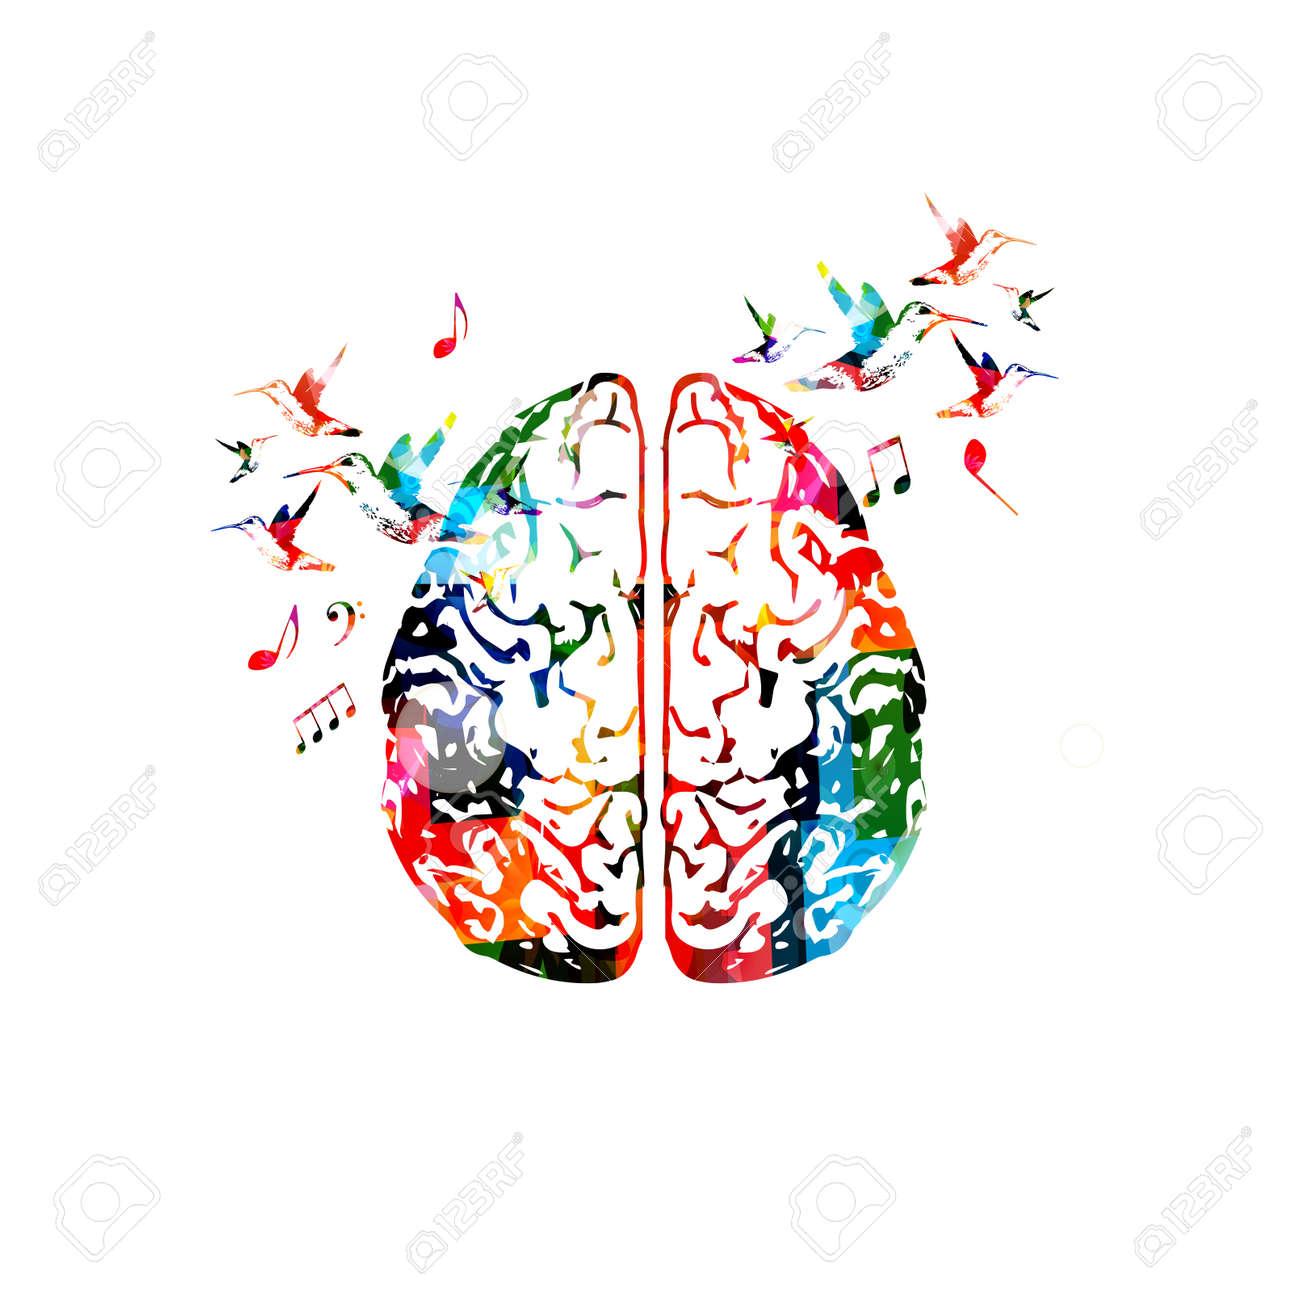 Colorful human brain illustration. - 85980663